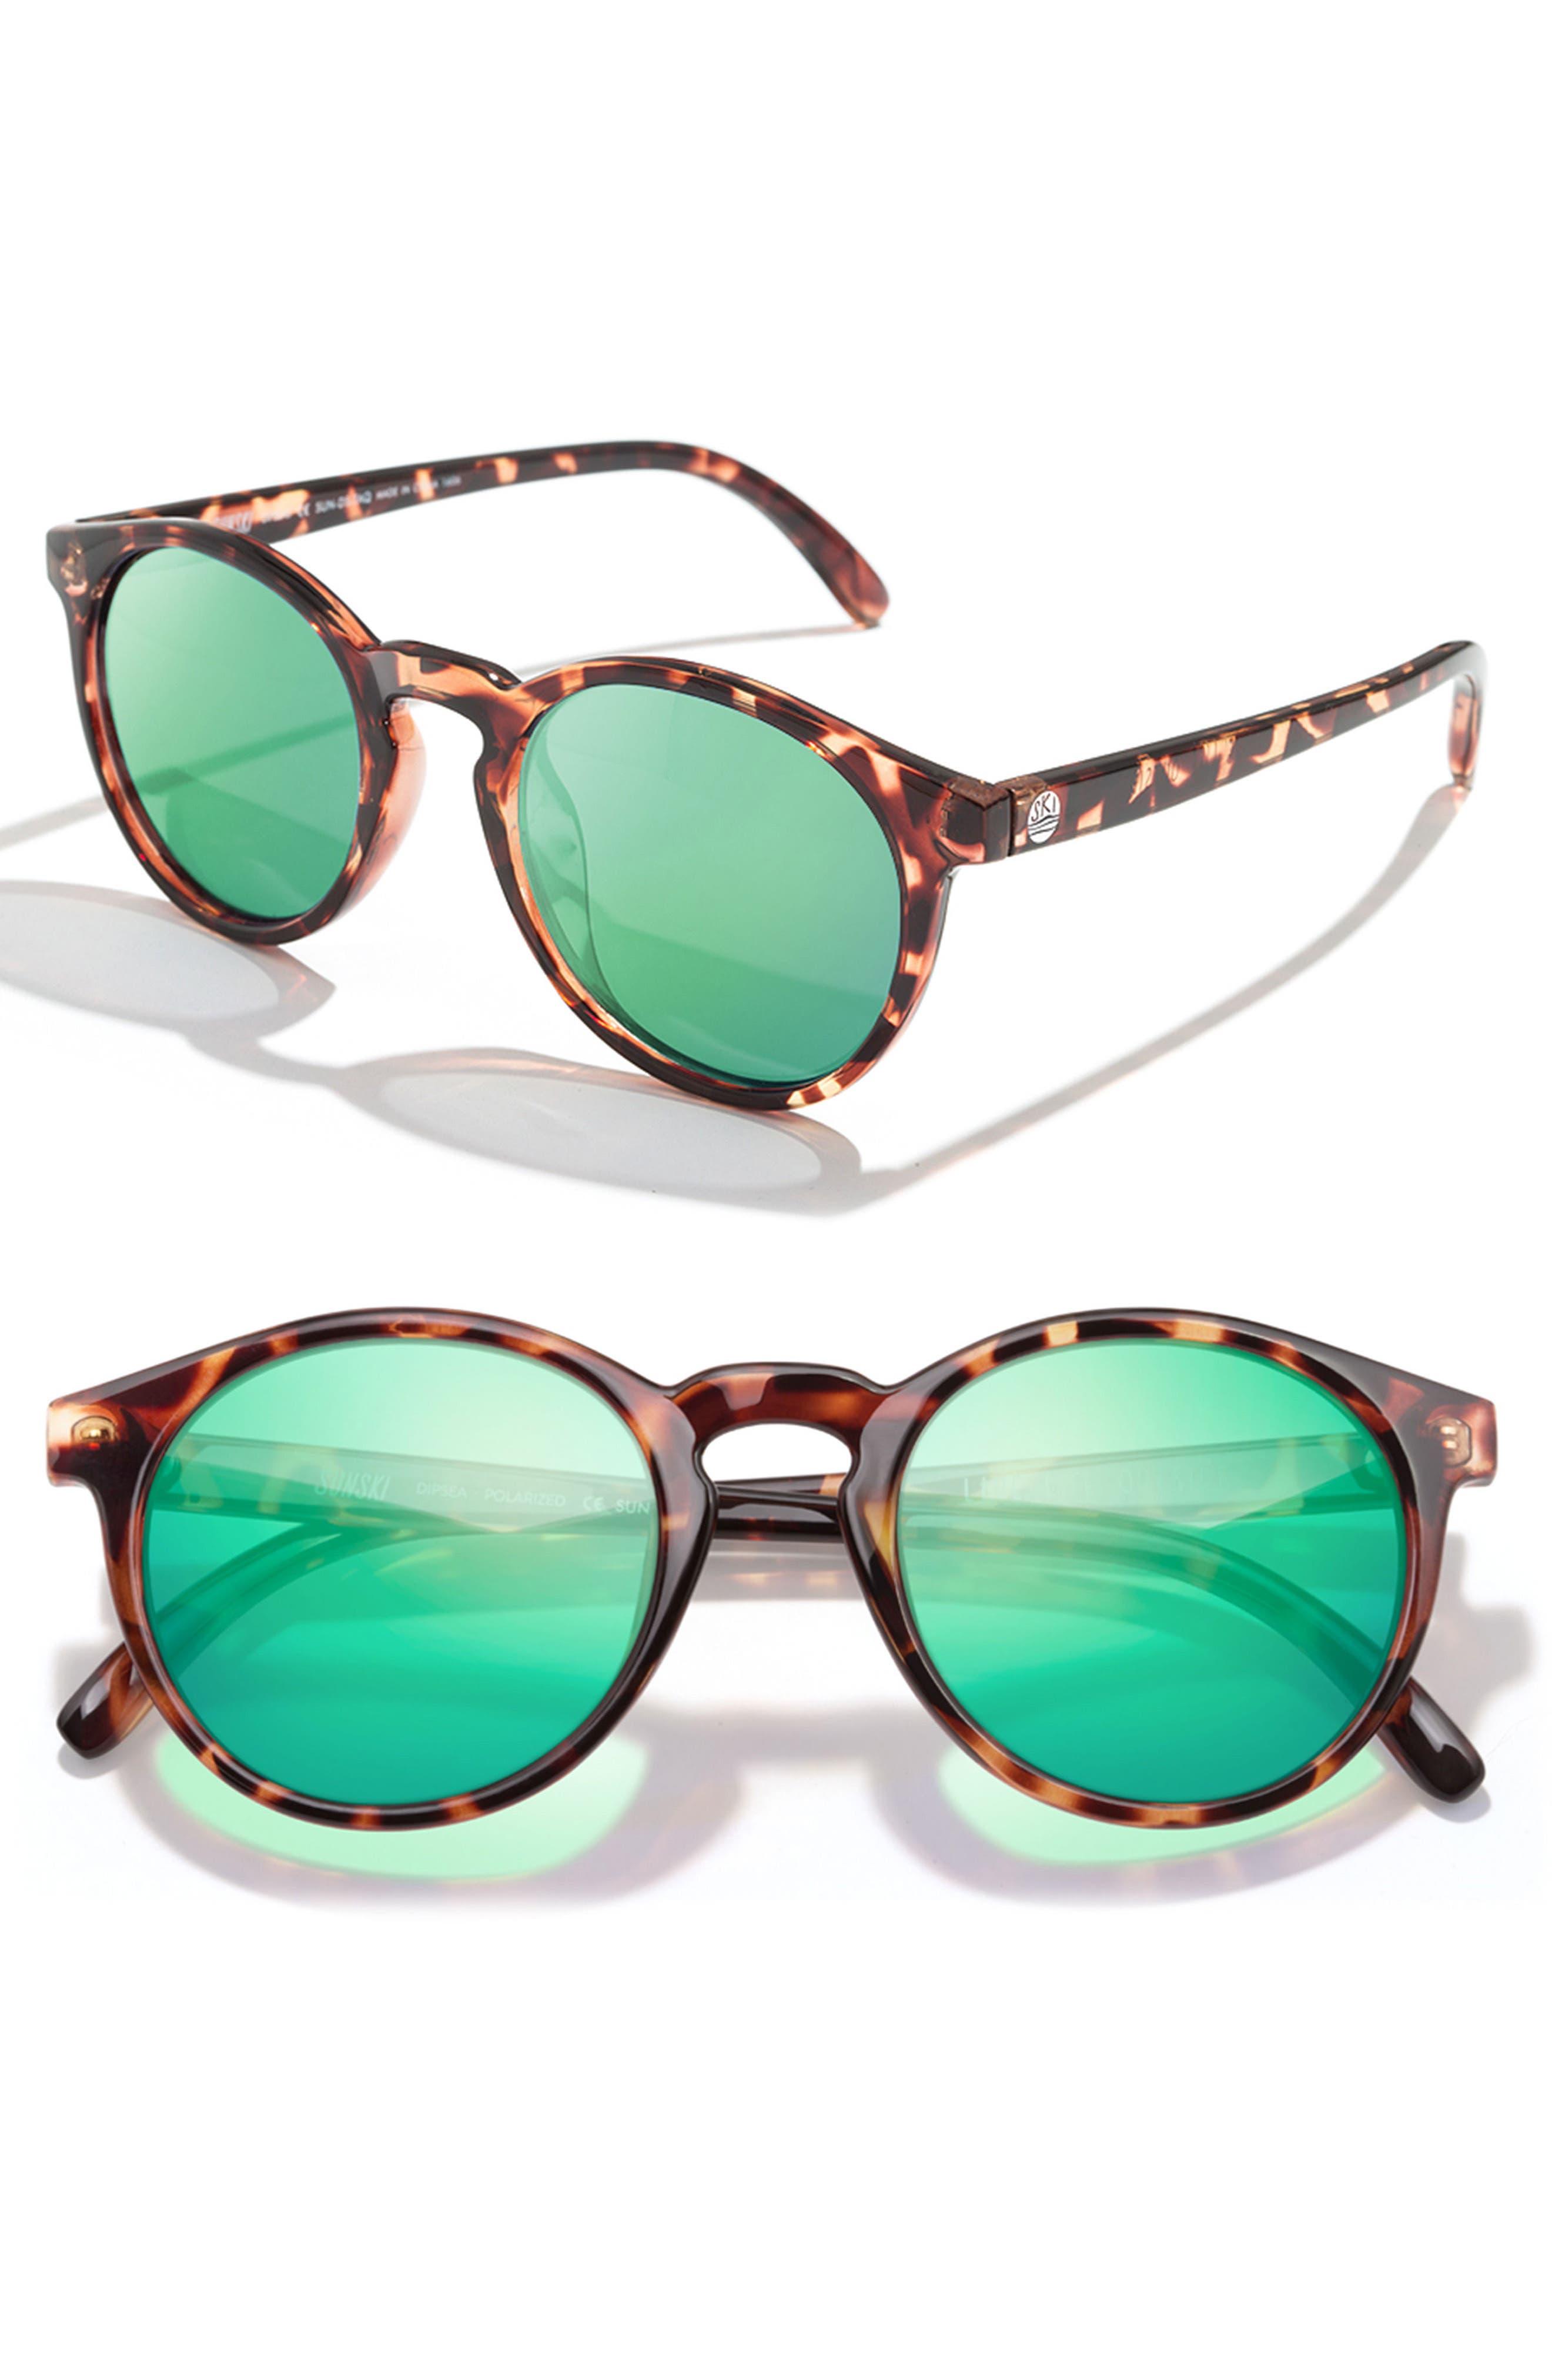 Sunski Dipsea 4m Polarized Sunglasses - Tortoise Emerald